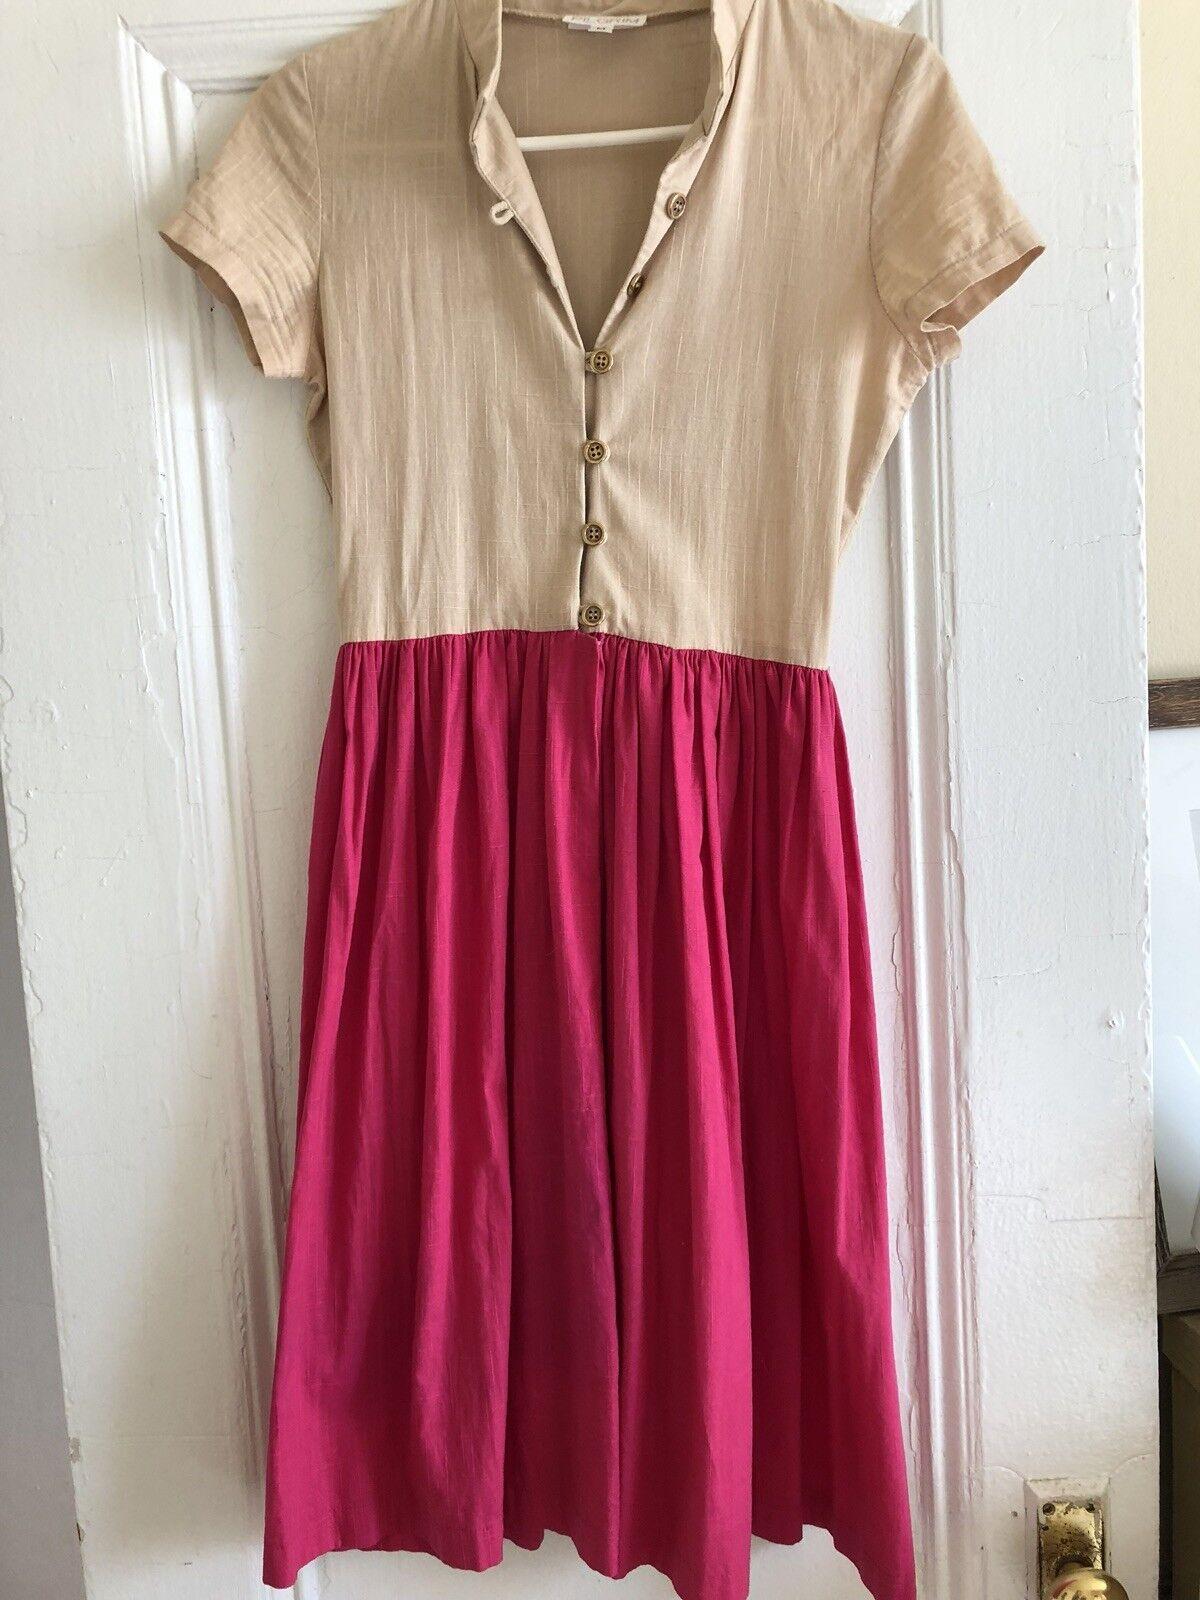 Vintage NYC Designer Pilgrim Cotton Dress With Metal Buttons